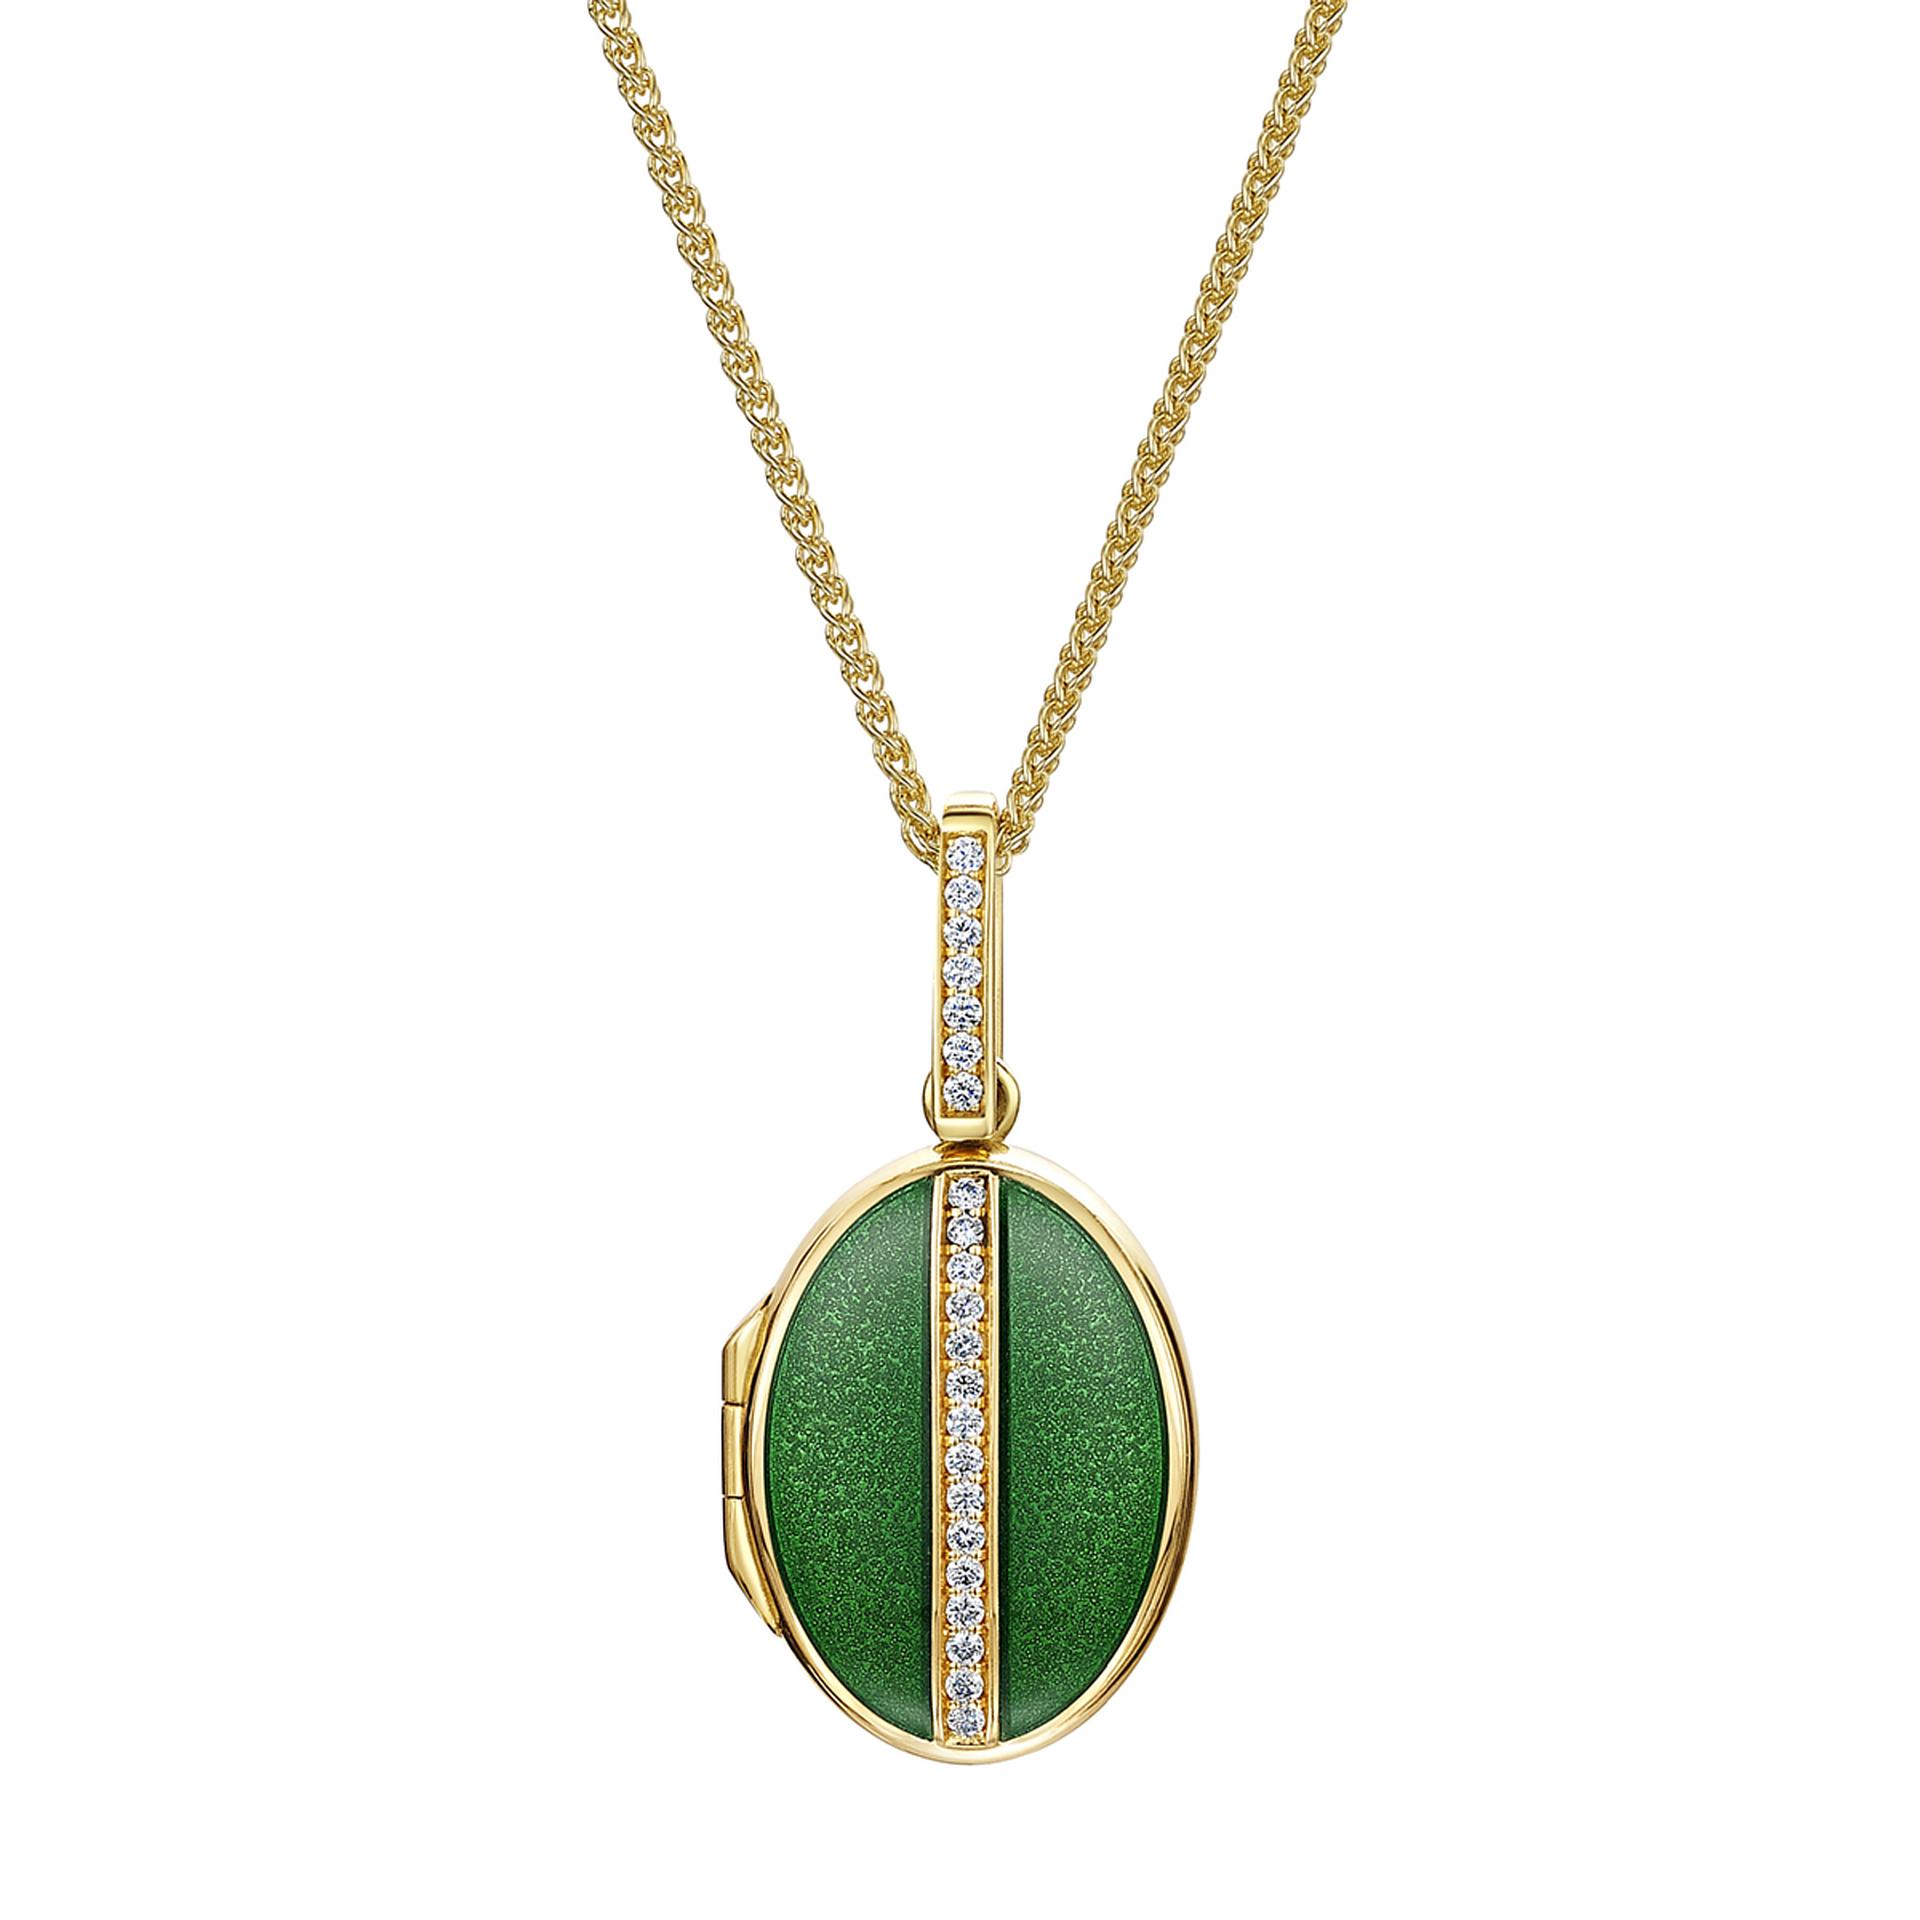 18ct Yellow gold Oval Diamond & Green Enamelled Locket